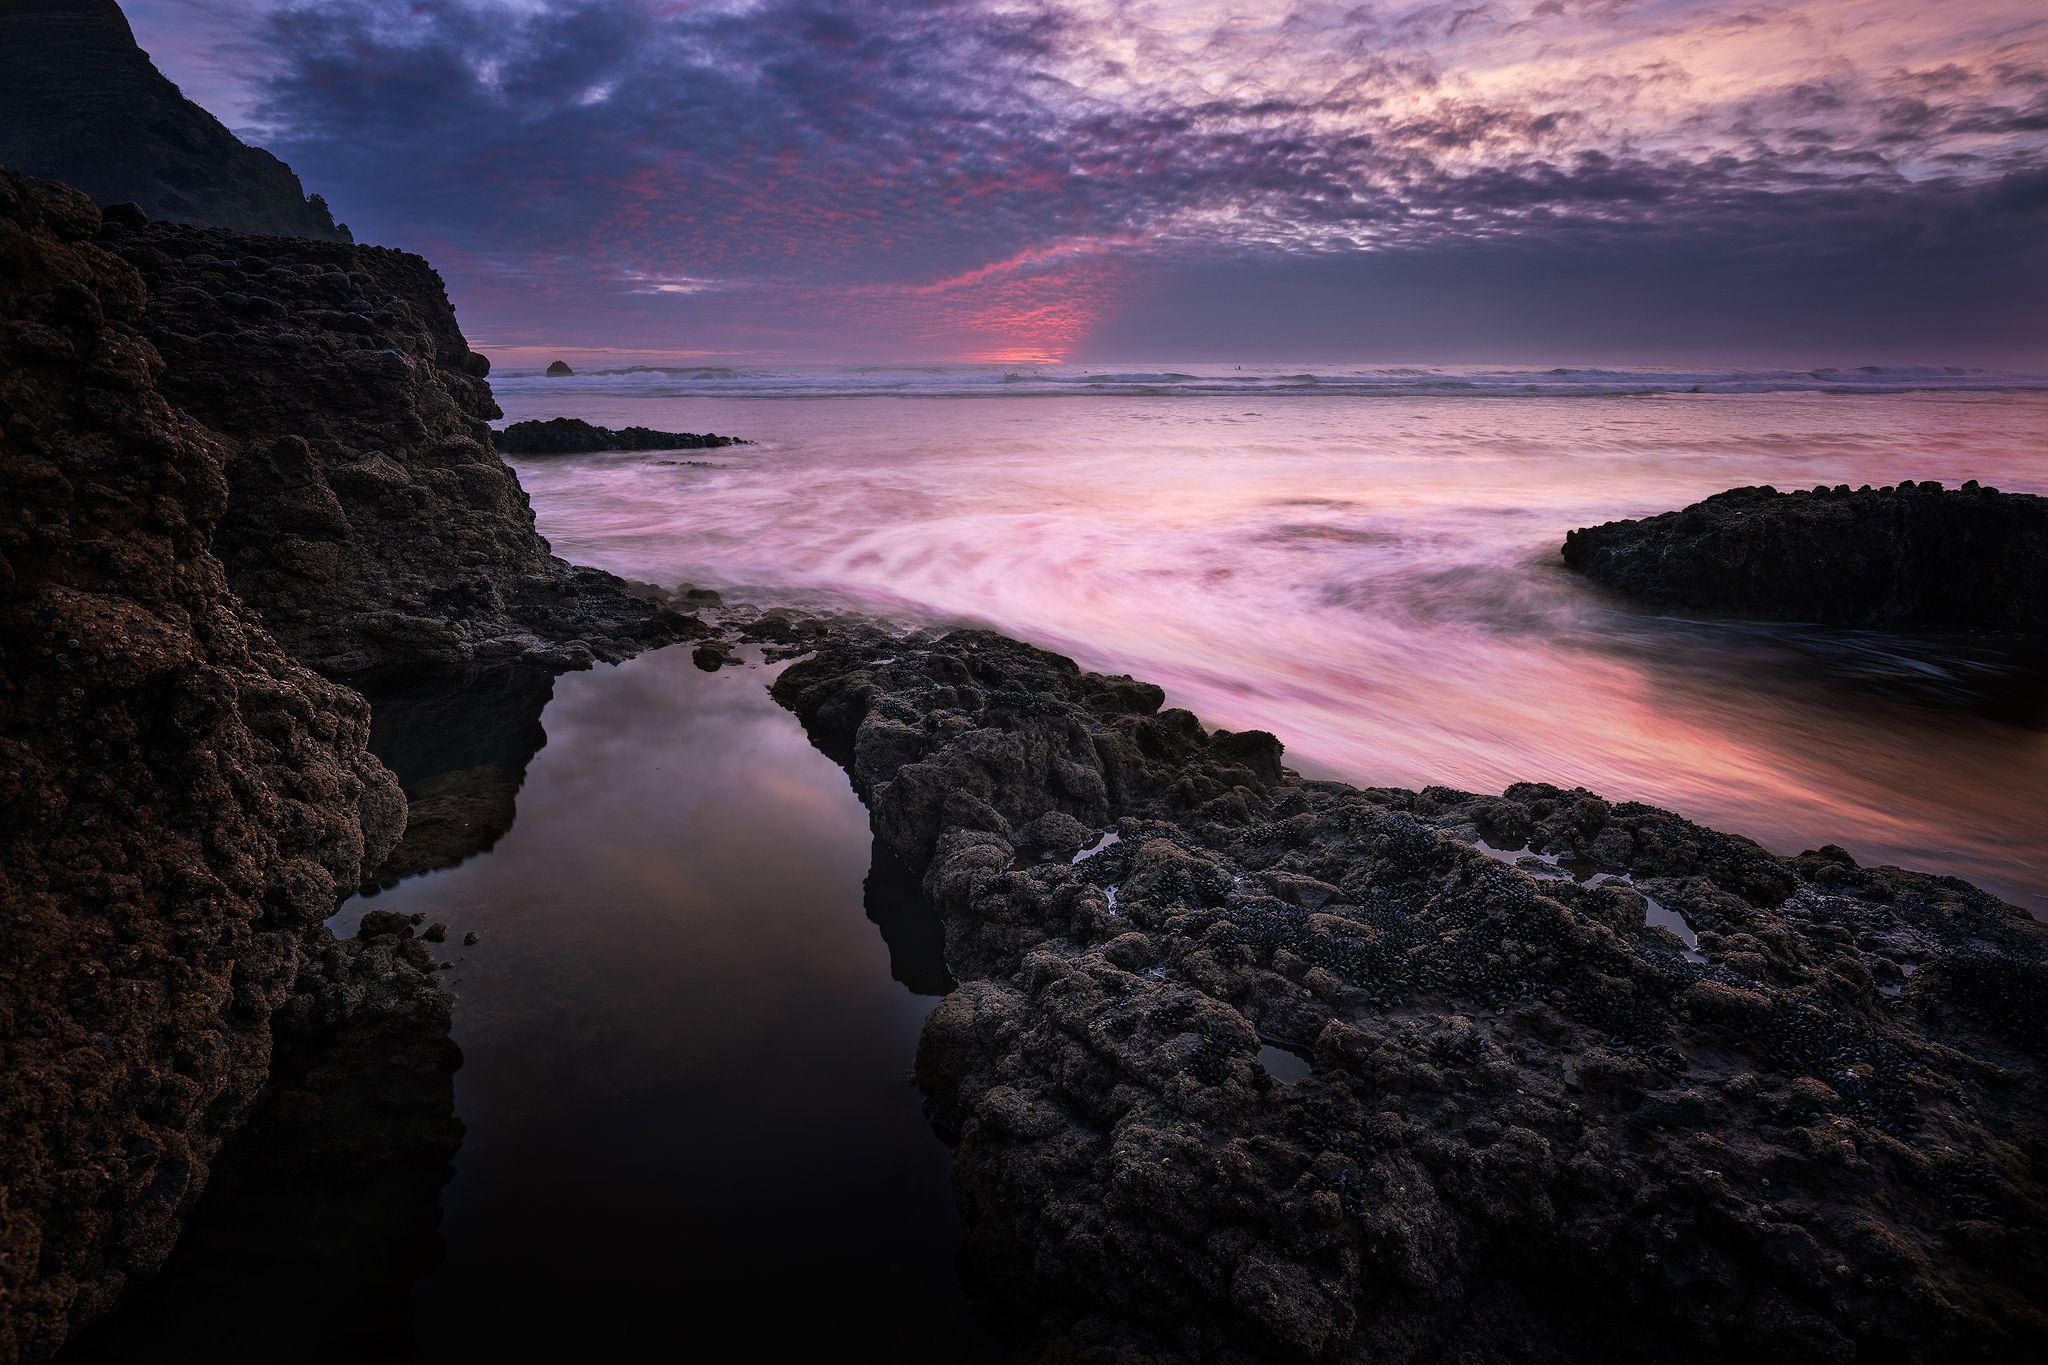 Piha Beach Rock Pool Rock Pools Beach Rocks Sky Color Sunset sea pink clouds coast rocks